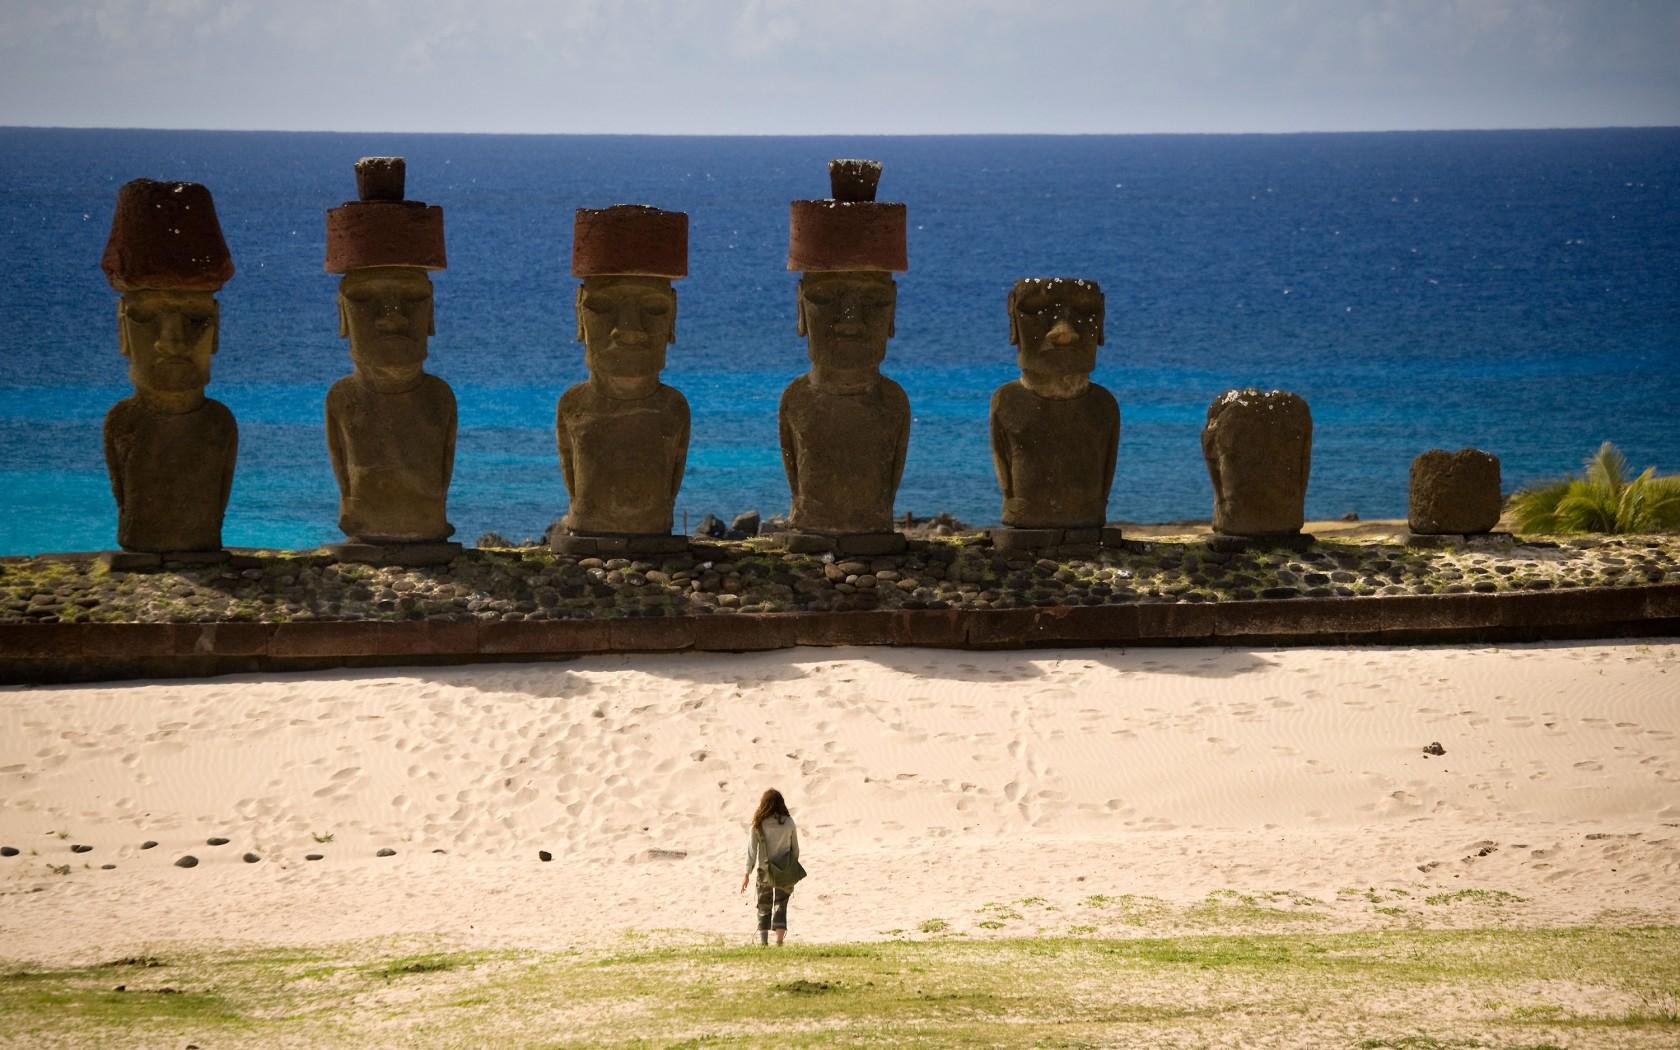 1Overs-Easter-Island-B3G7J4-1680x1050